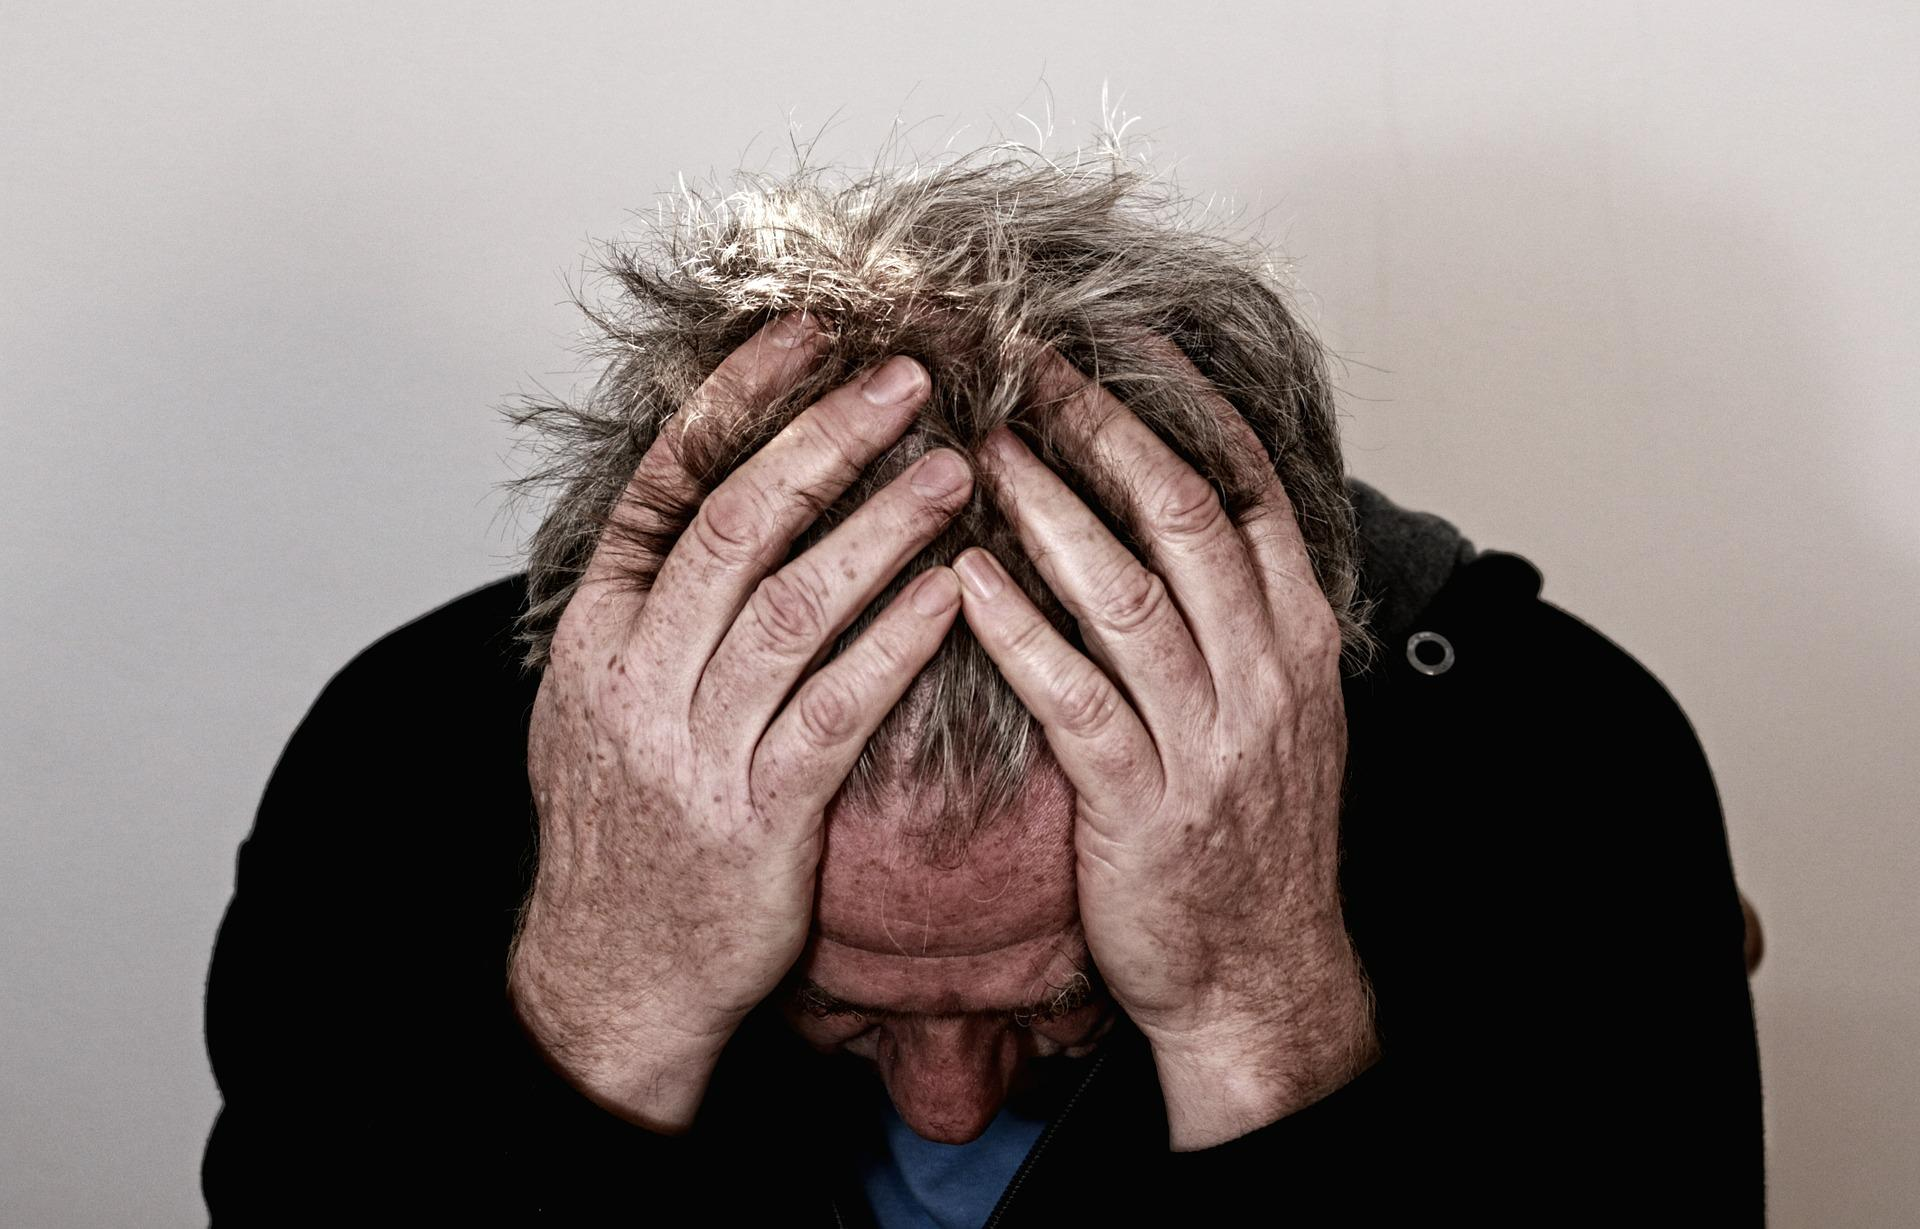 mental health decline in seniors